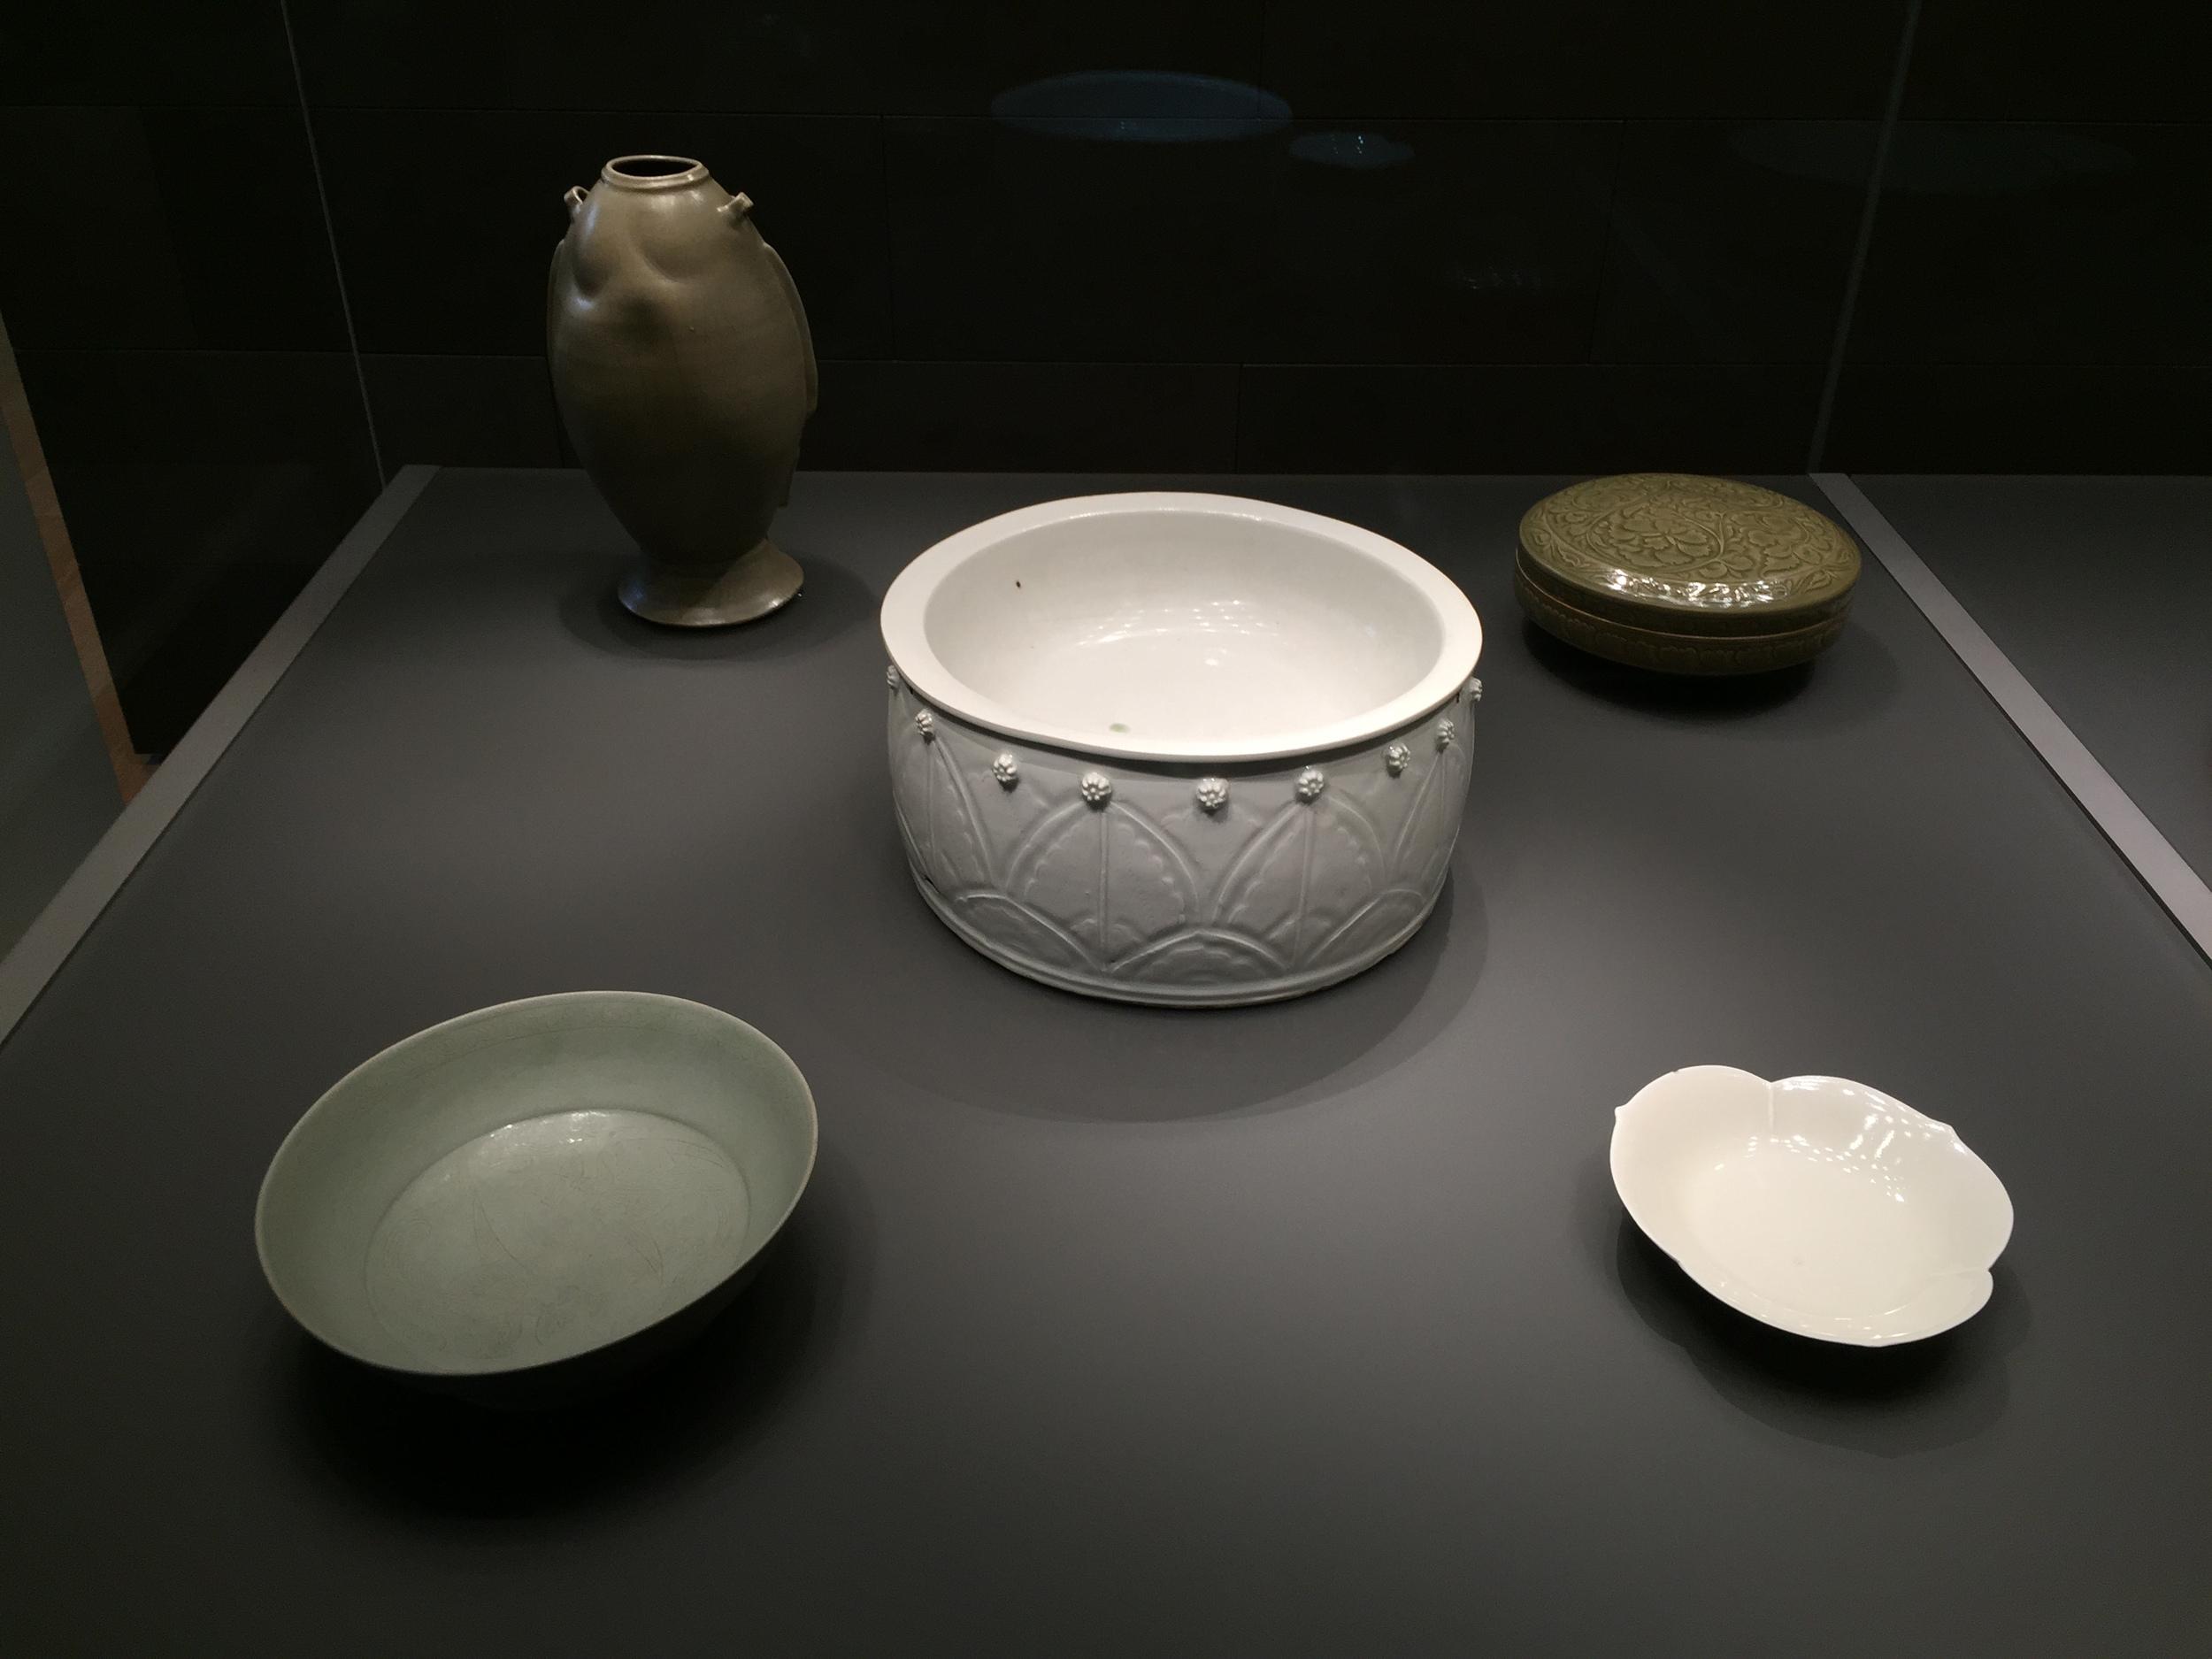 Chinese-Porcelain-British-Museum-Percival-David-jessewaugh.com-1.jpg